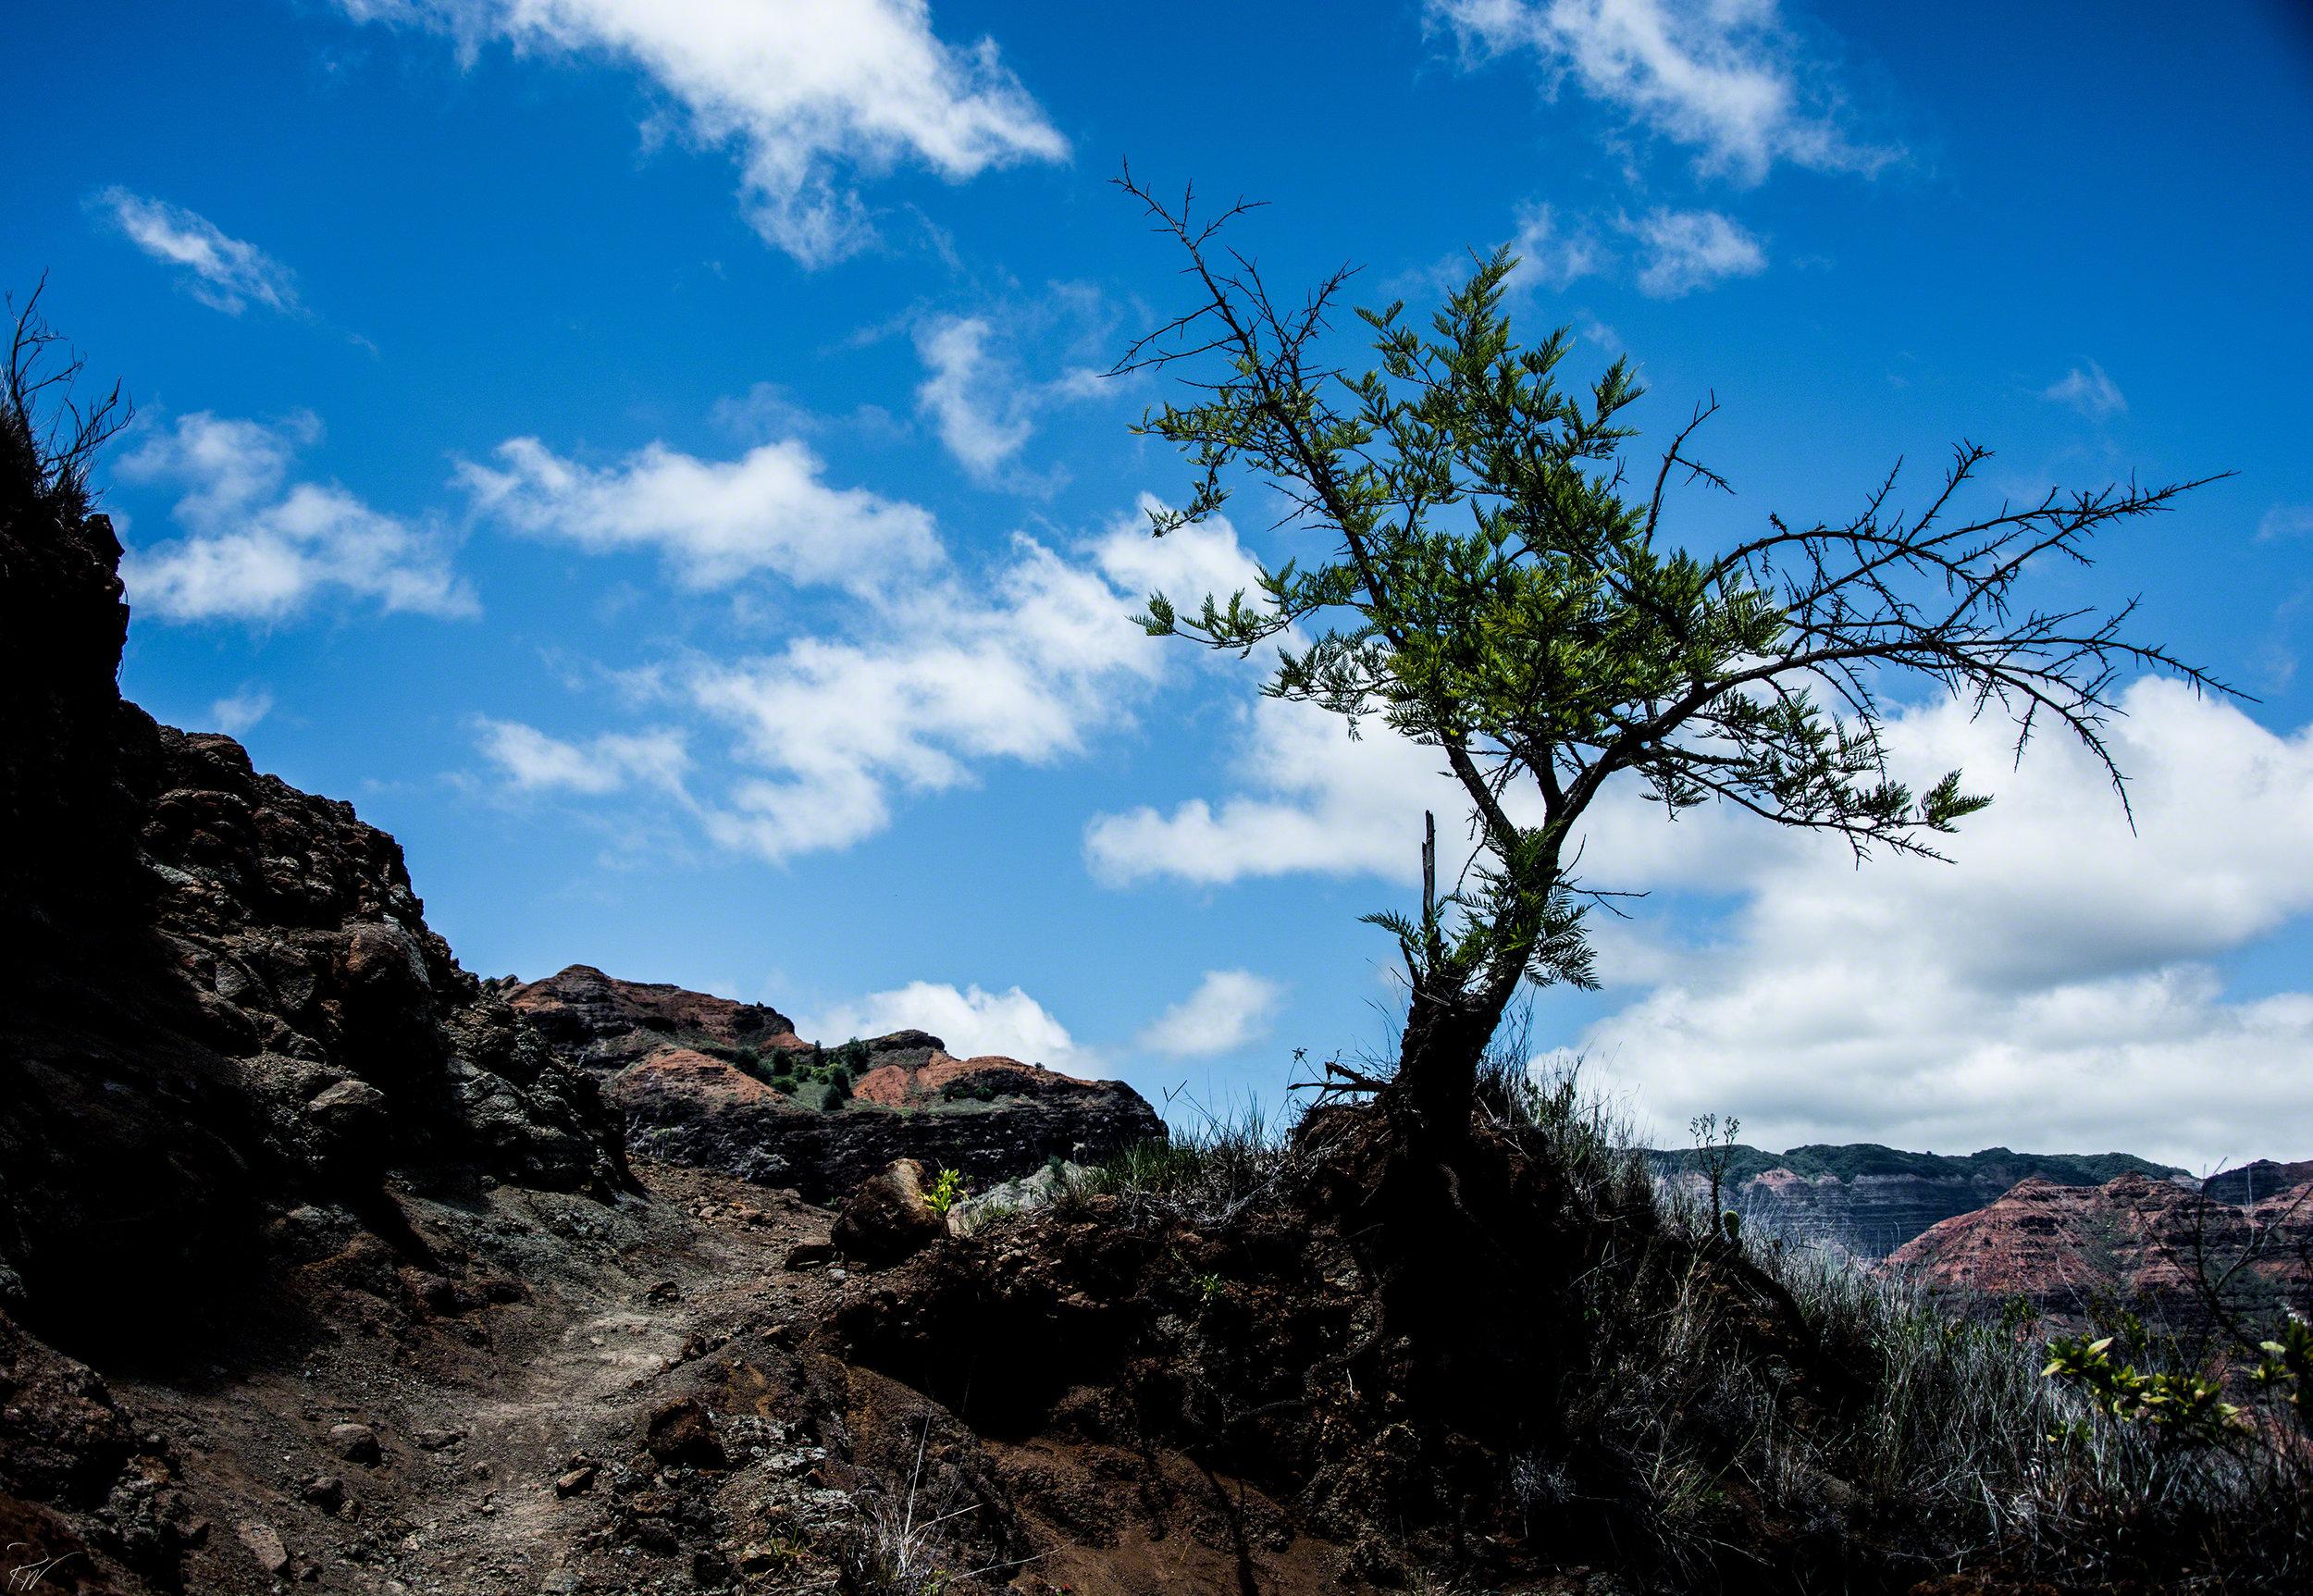 Hawaii-2016-0211-website.jpg